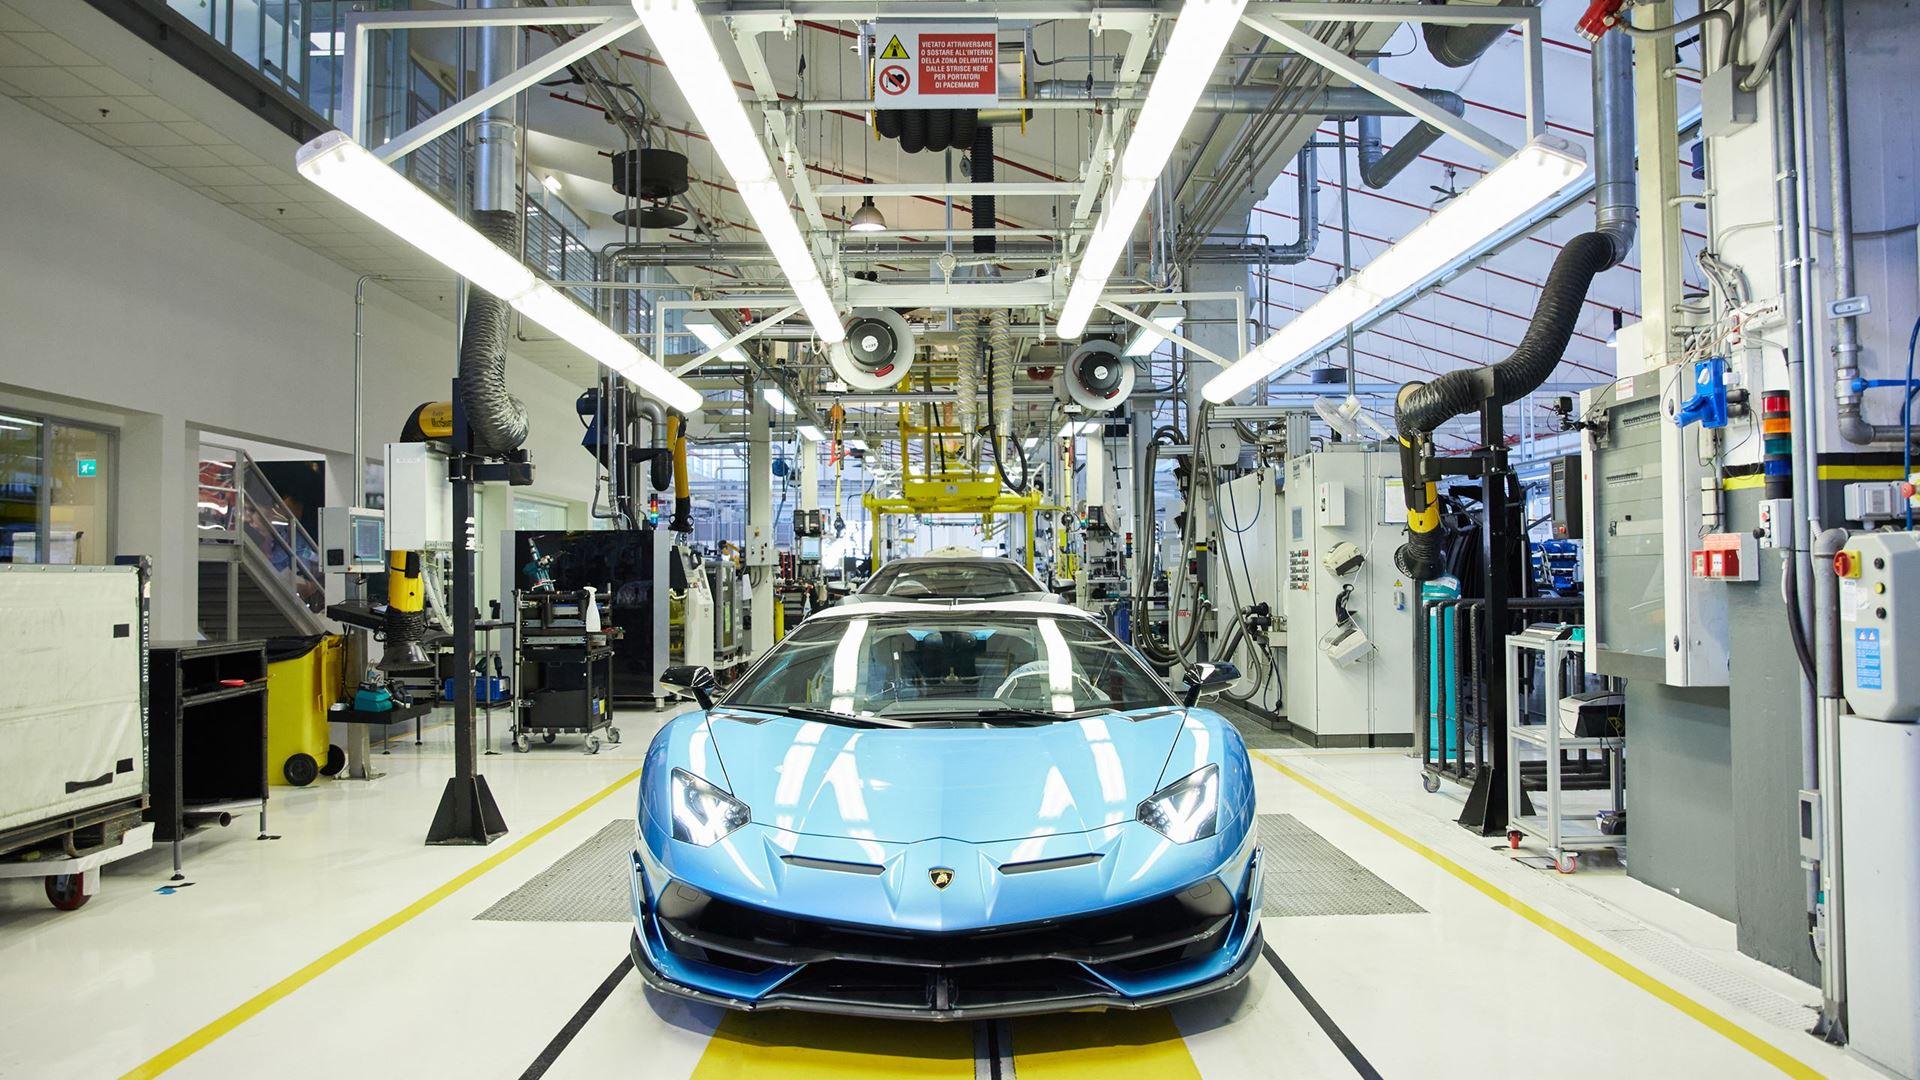 Automobili Lamborghini: sales soaring, record first quarter - Image 5